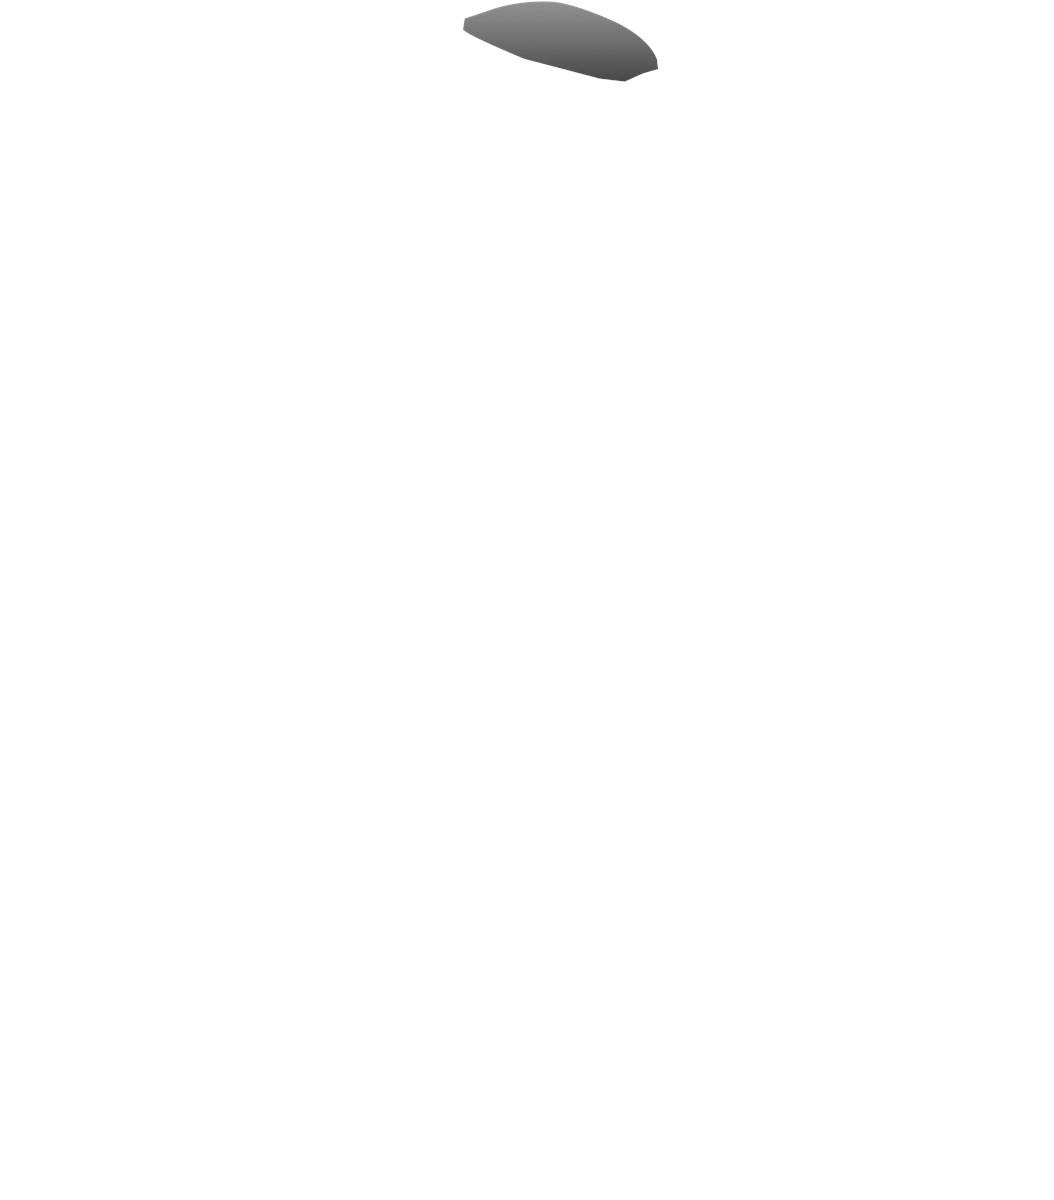 Specialized Womens Solar Vita Short Sleeve 2013 Jersey Black £25.00 9520f778f